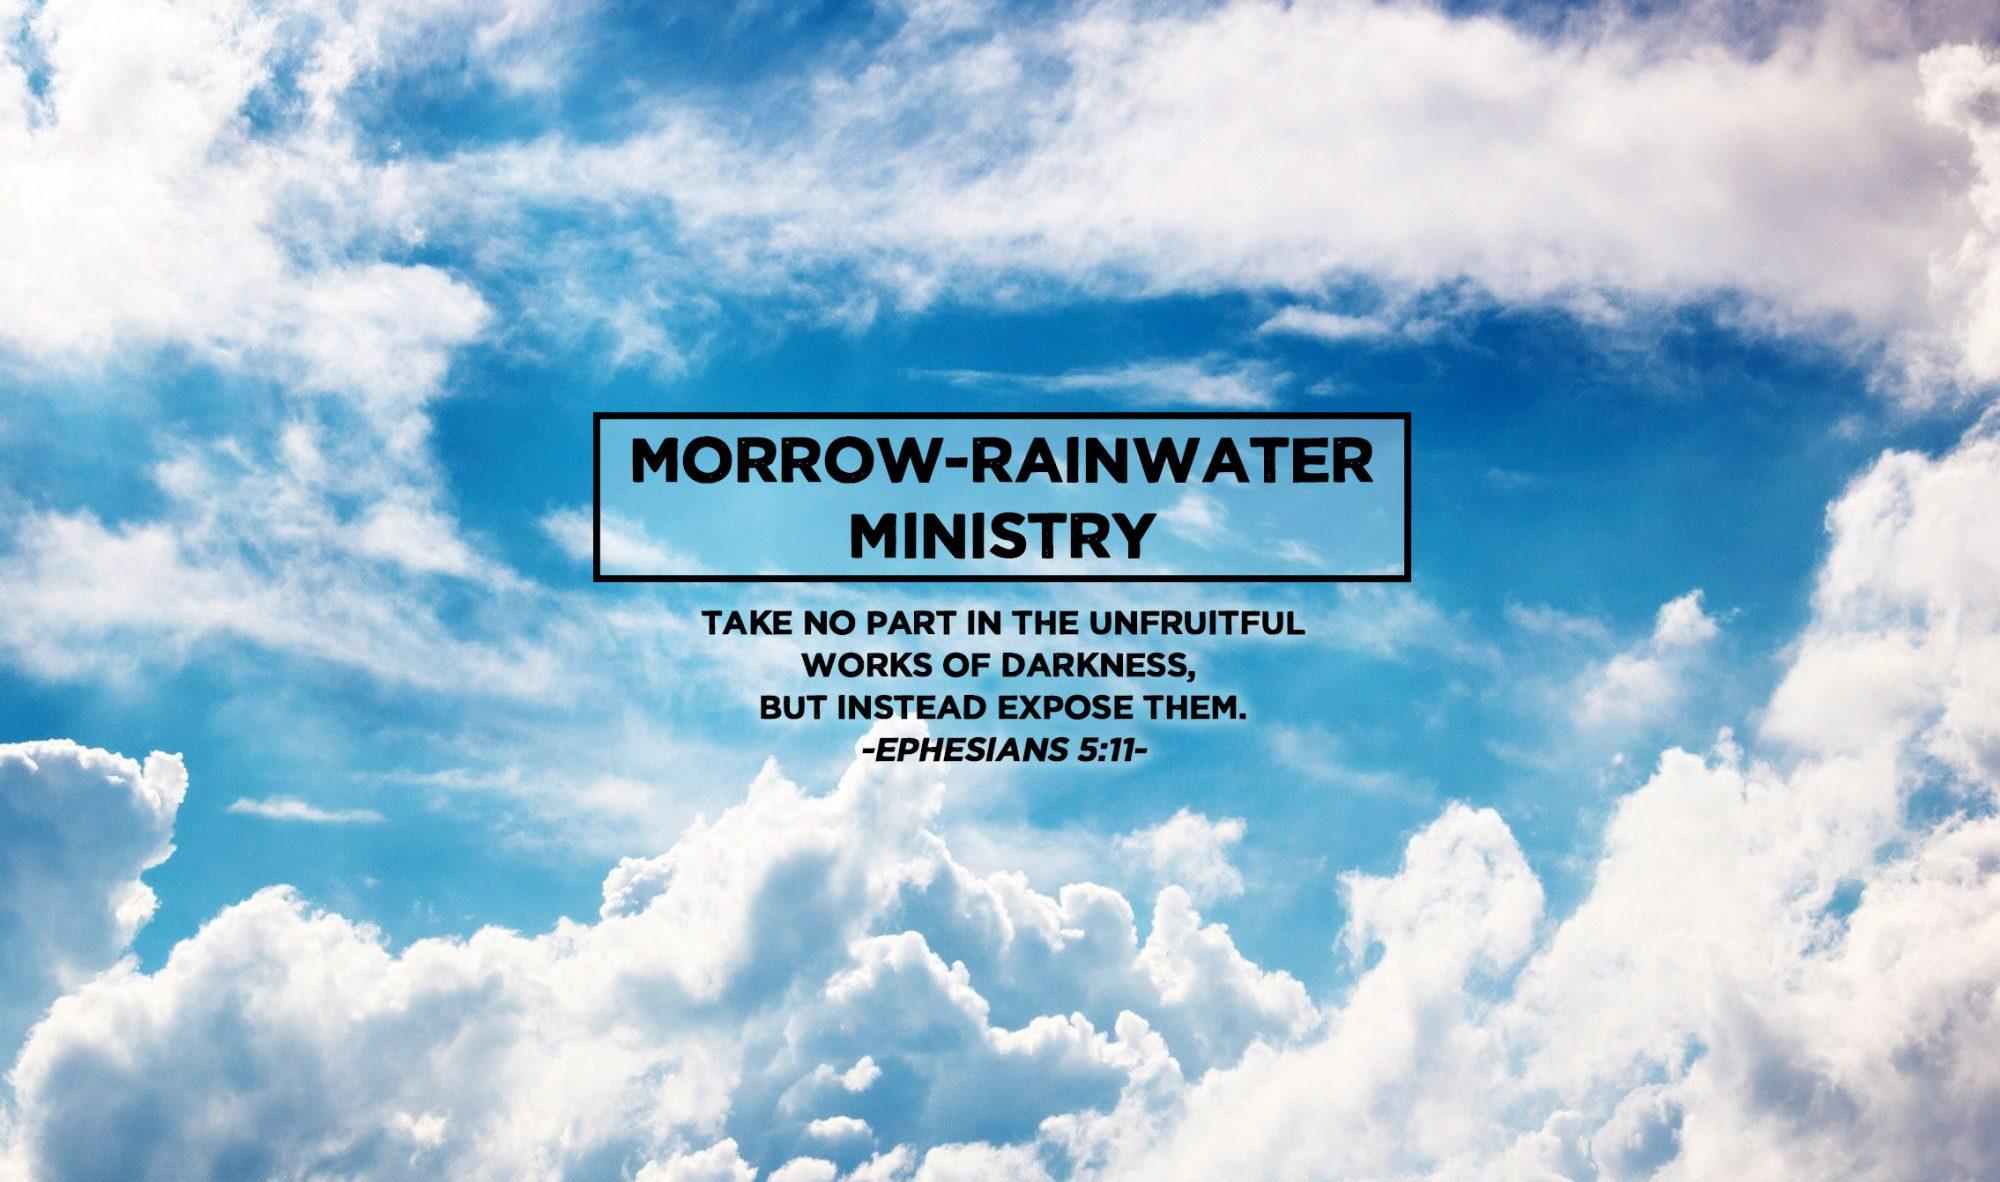 Morrow-Rainwater Ministry